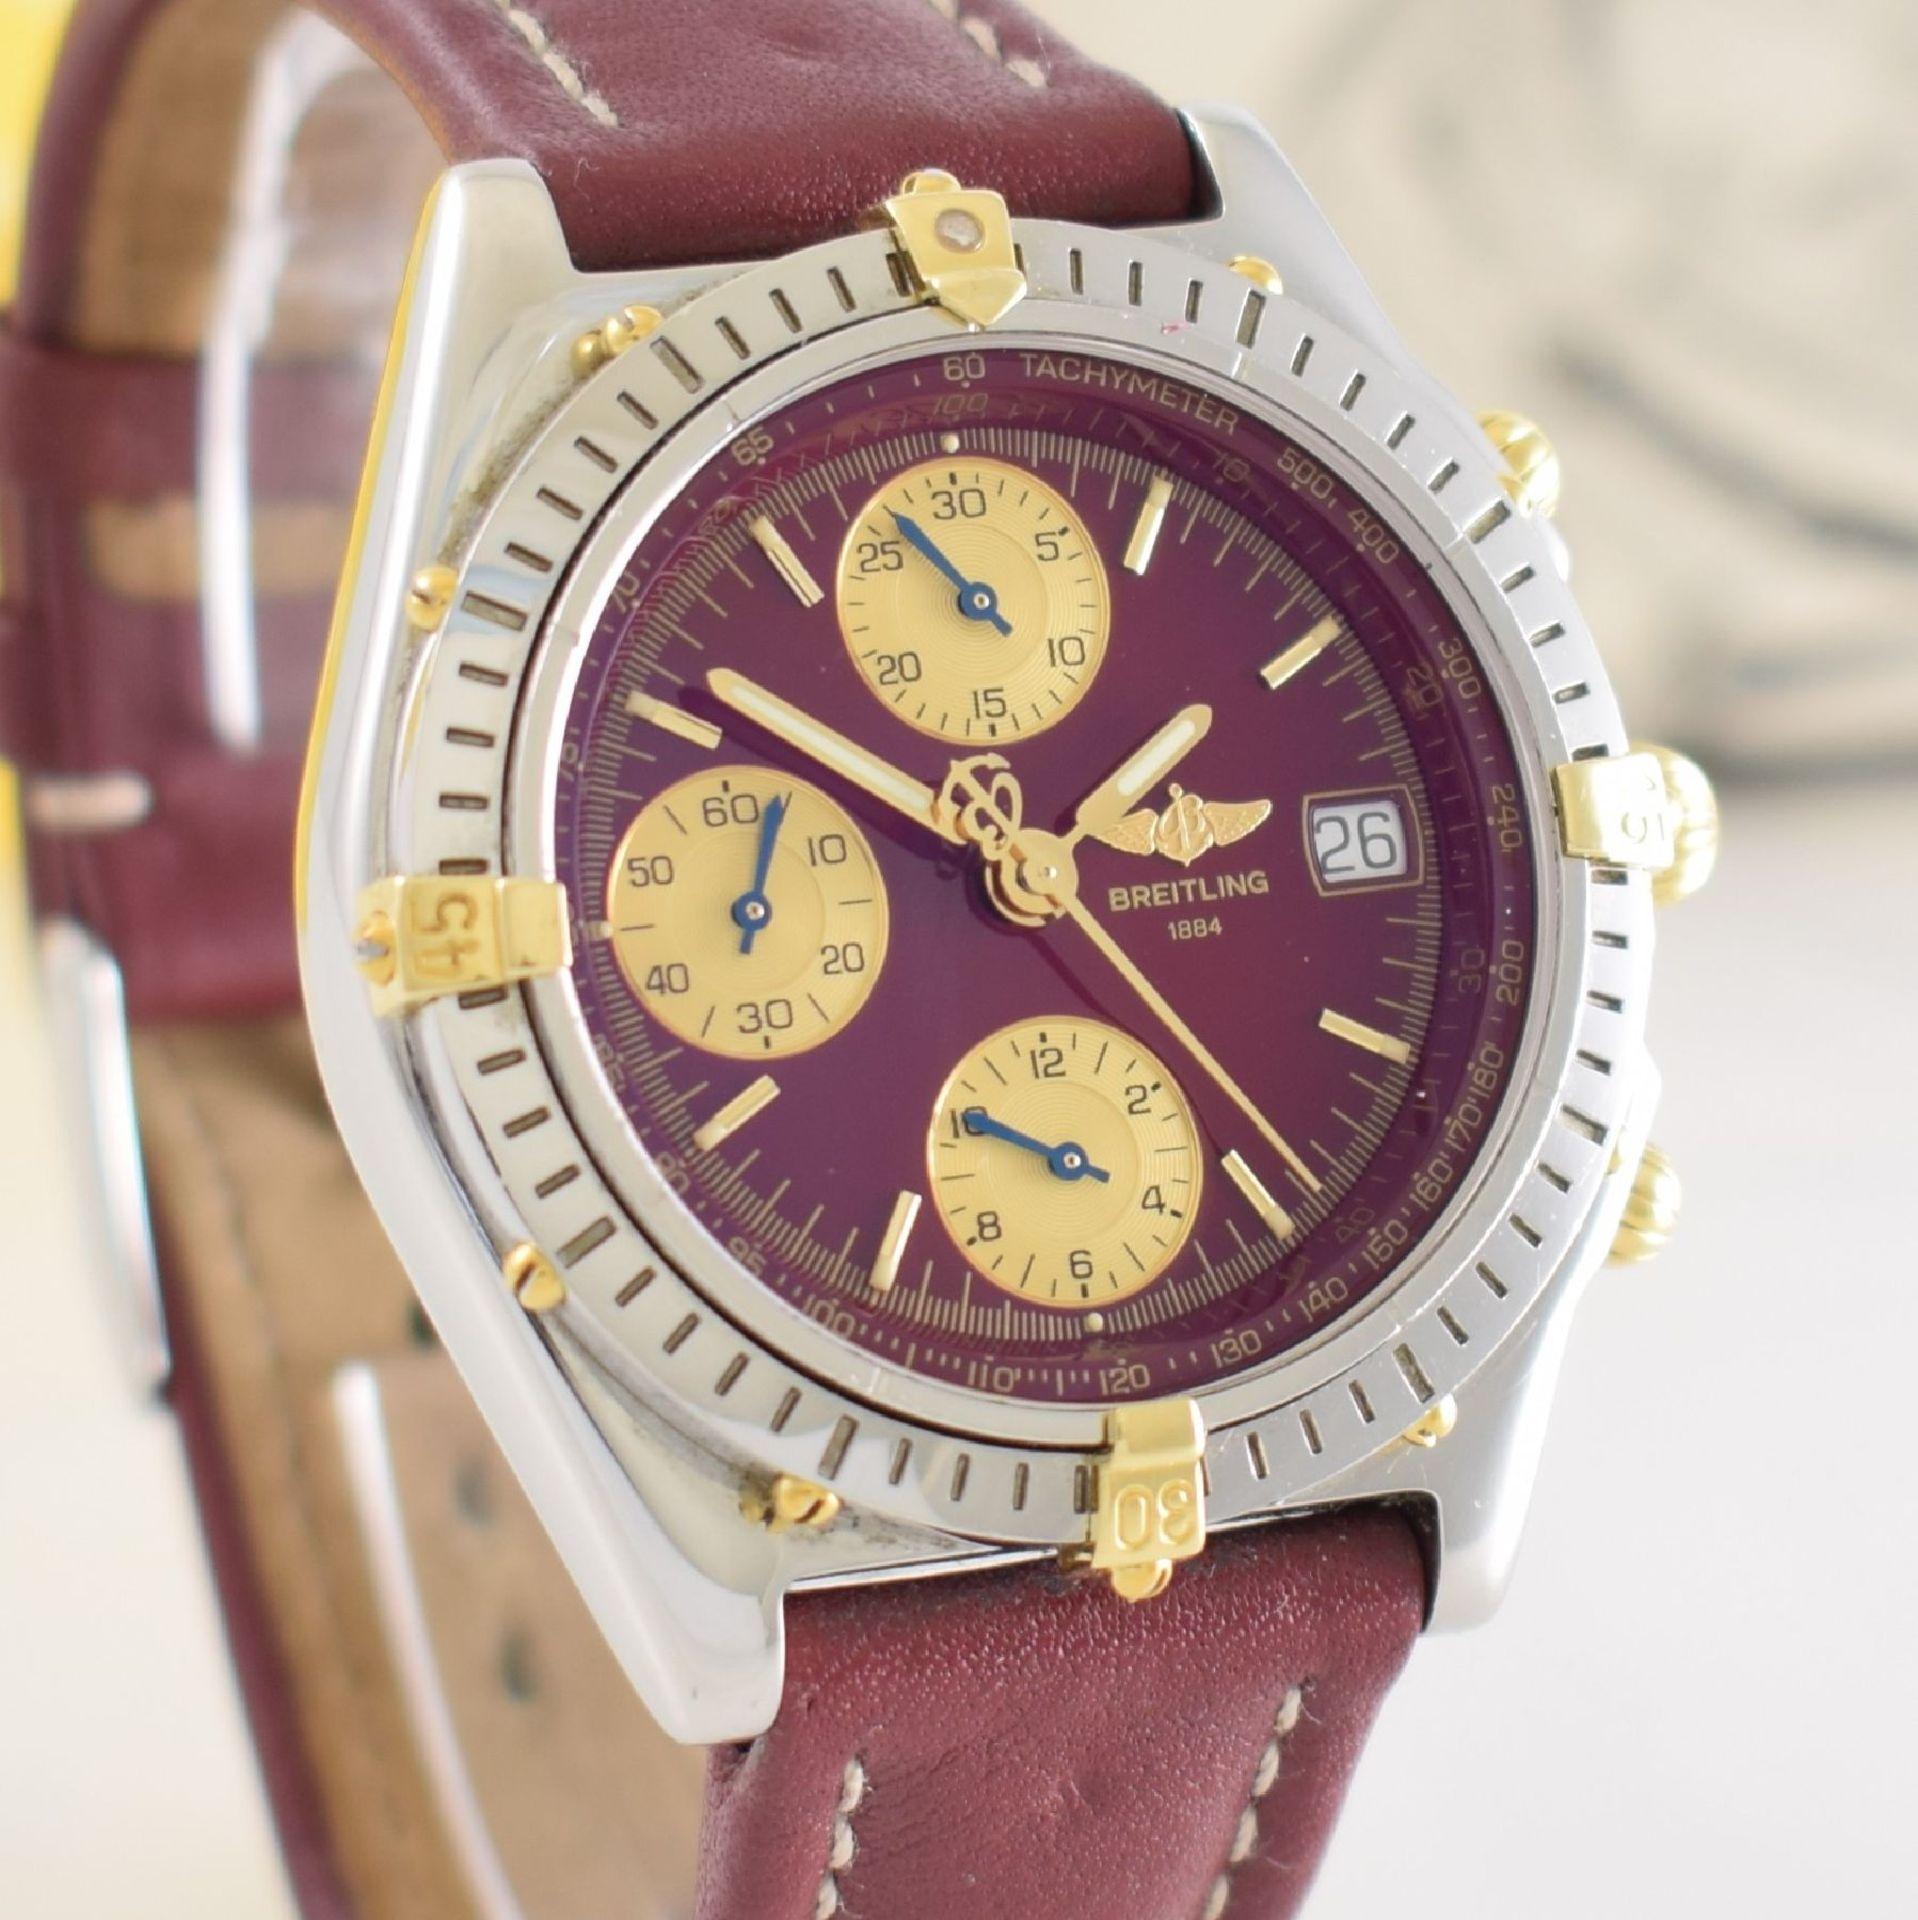 BREITLING Chronomat Herrenarmbanduhr mit Chronograph, Schweiz verk. lt. beil orig. Garantiekarte - Bild 8 aus 8